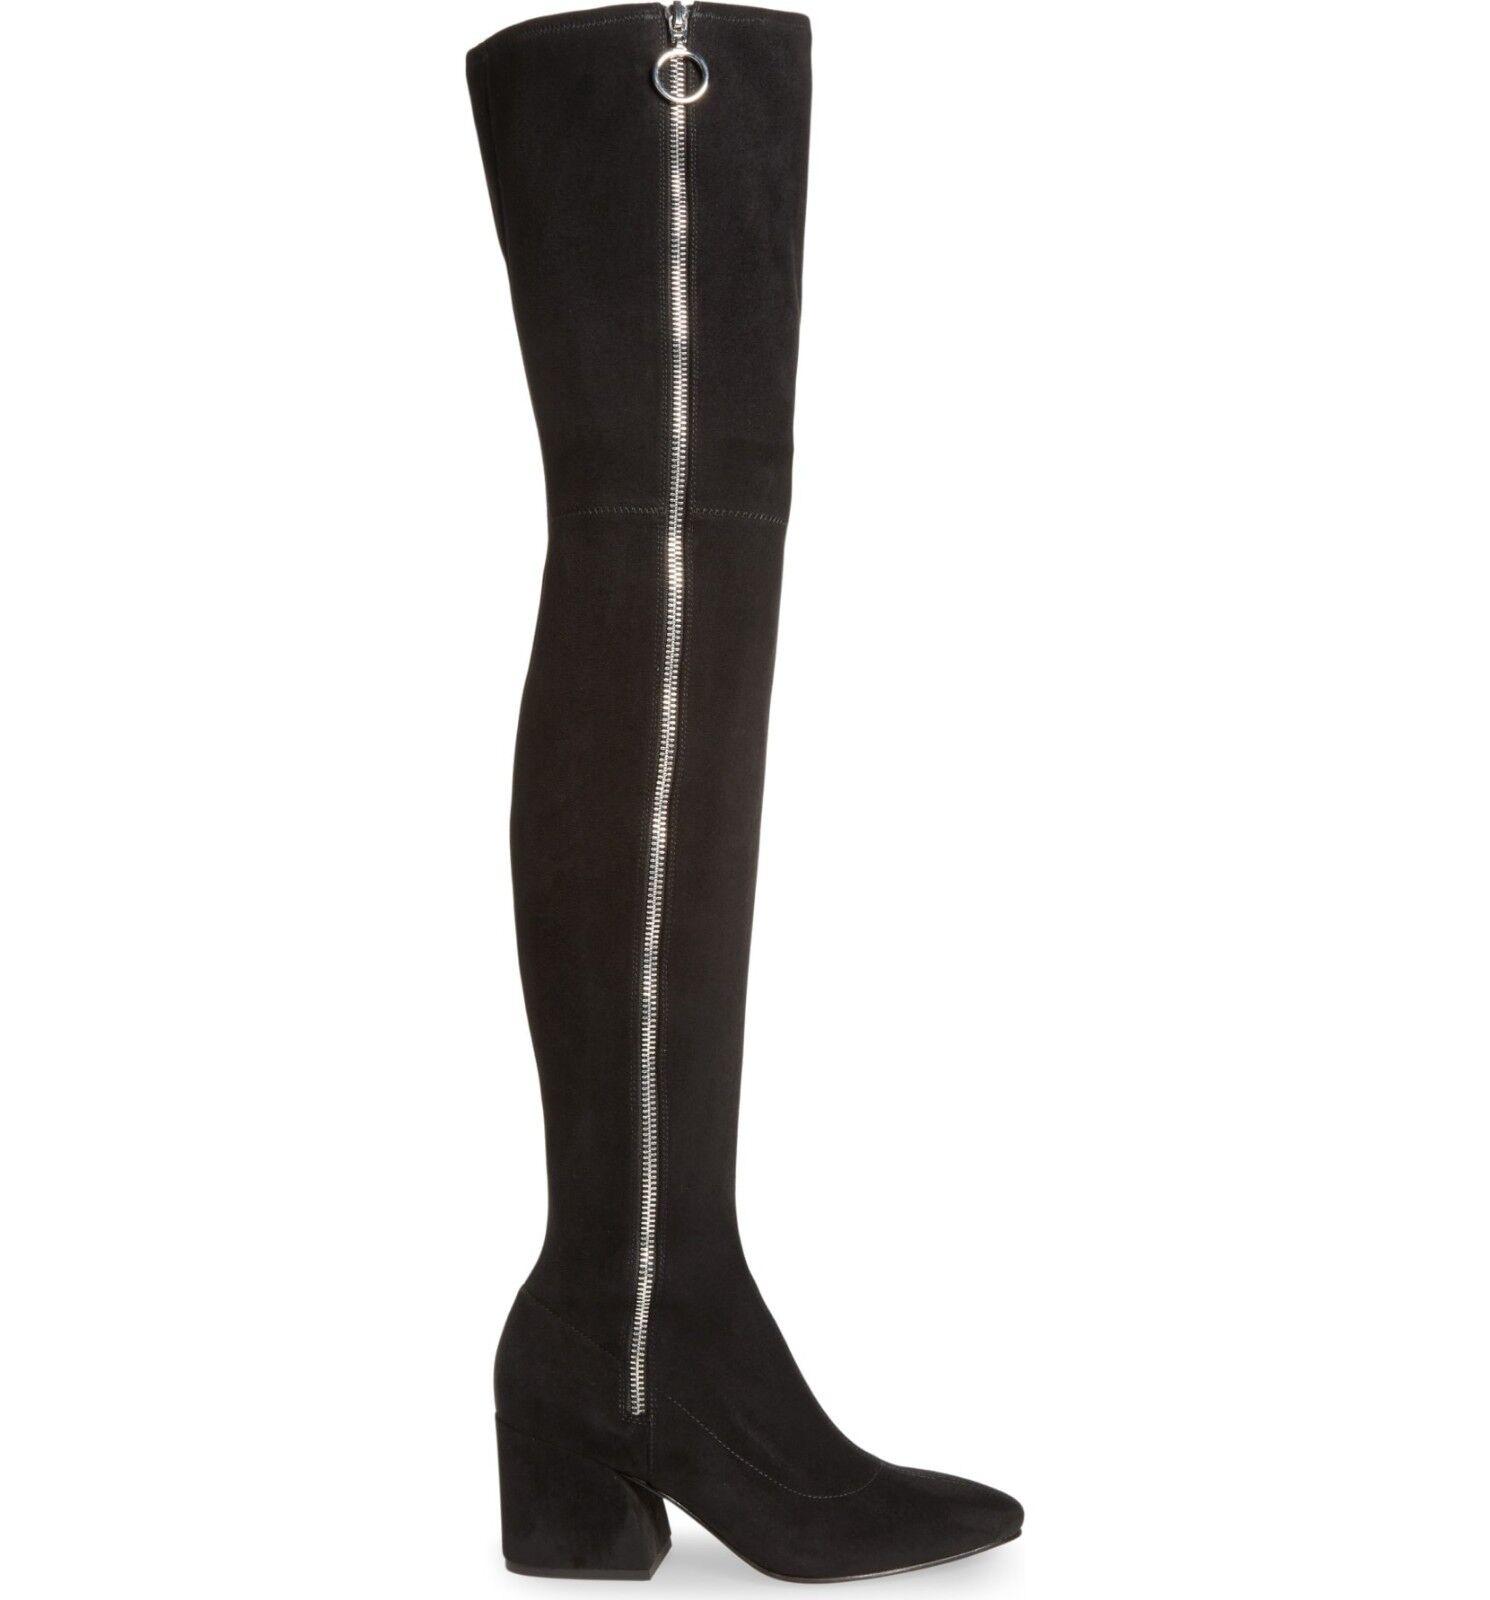 250 DOLCE VITA VIX THIGH HIGH OTK SUEDE BLACK BLOCK HEEL SEXY  BOOT 6.5 (M12)